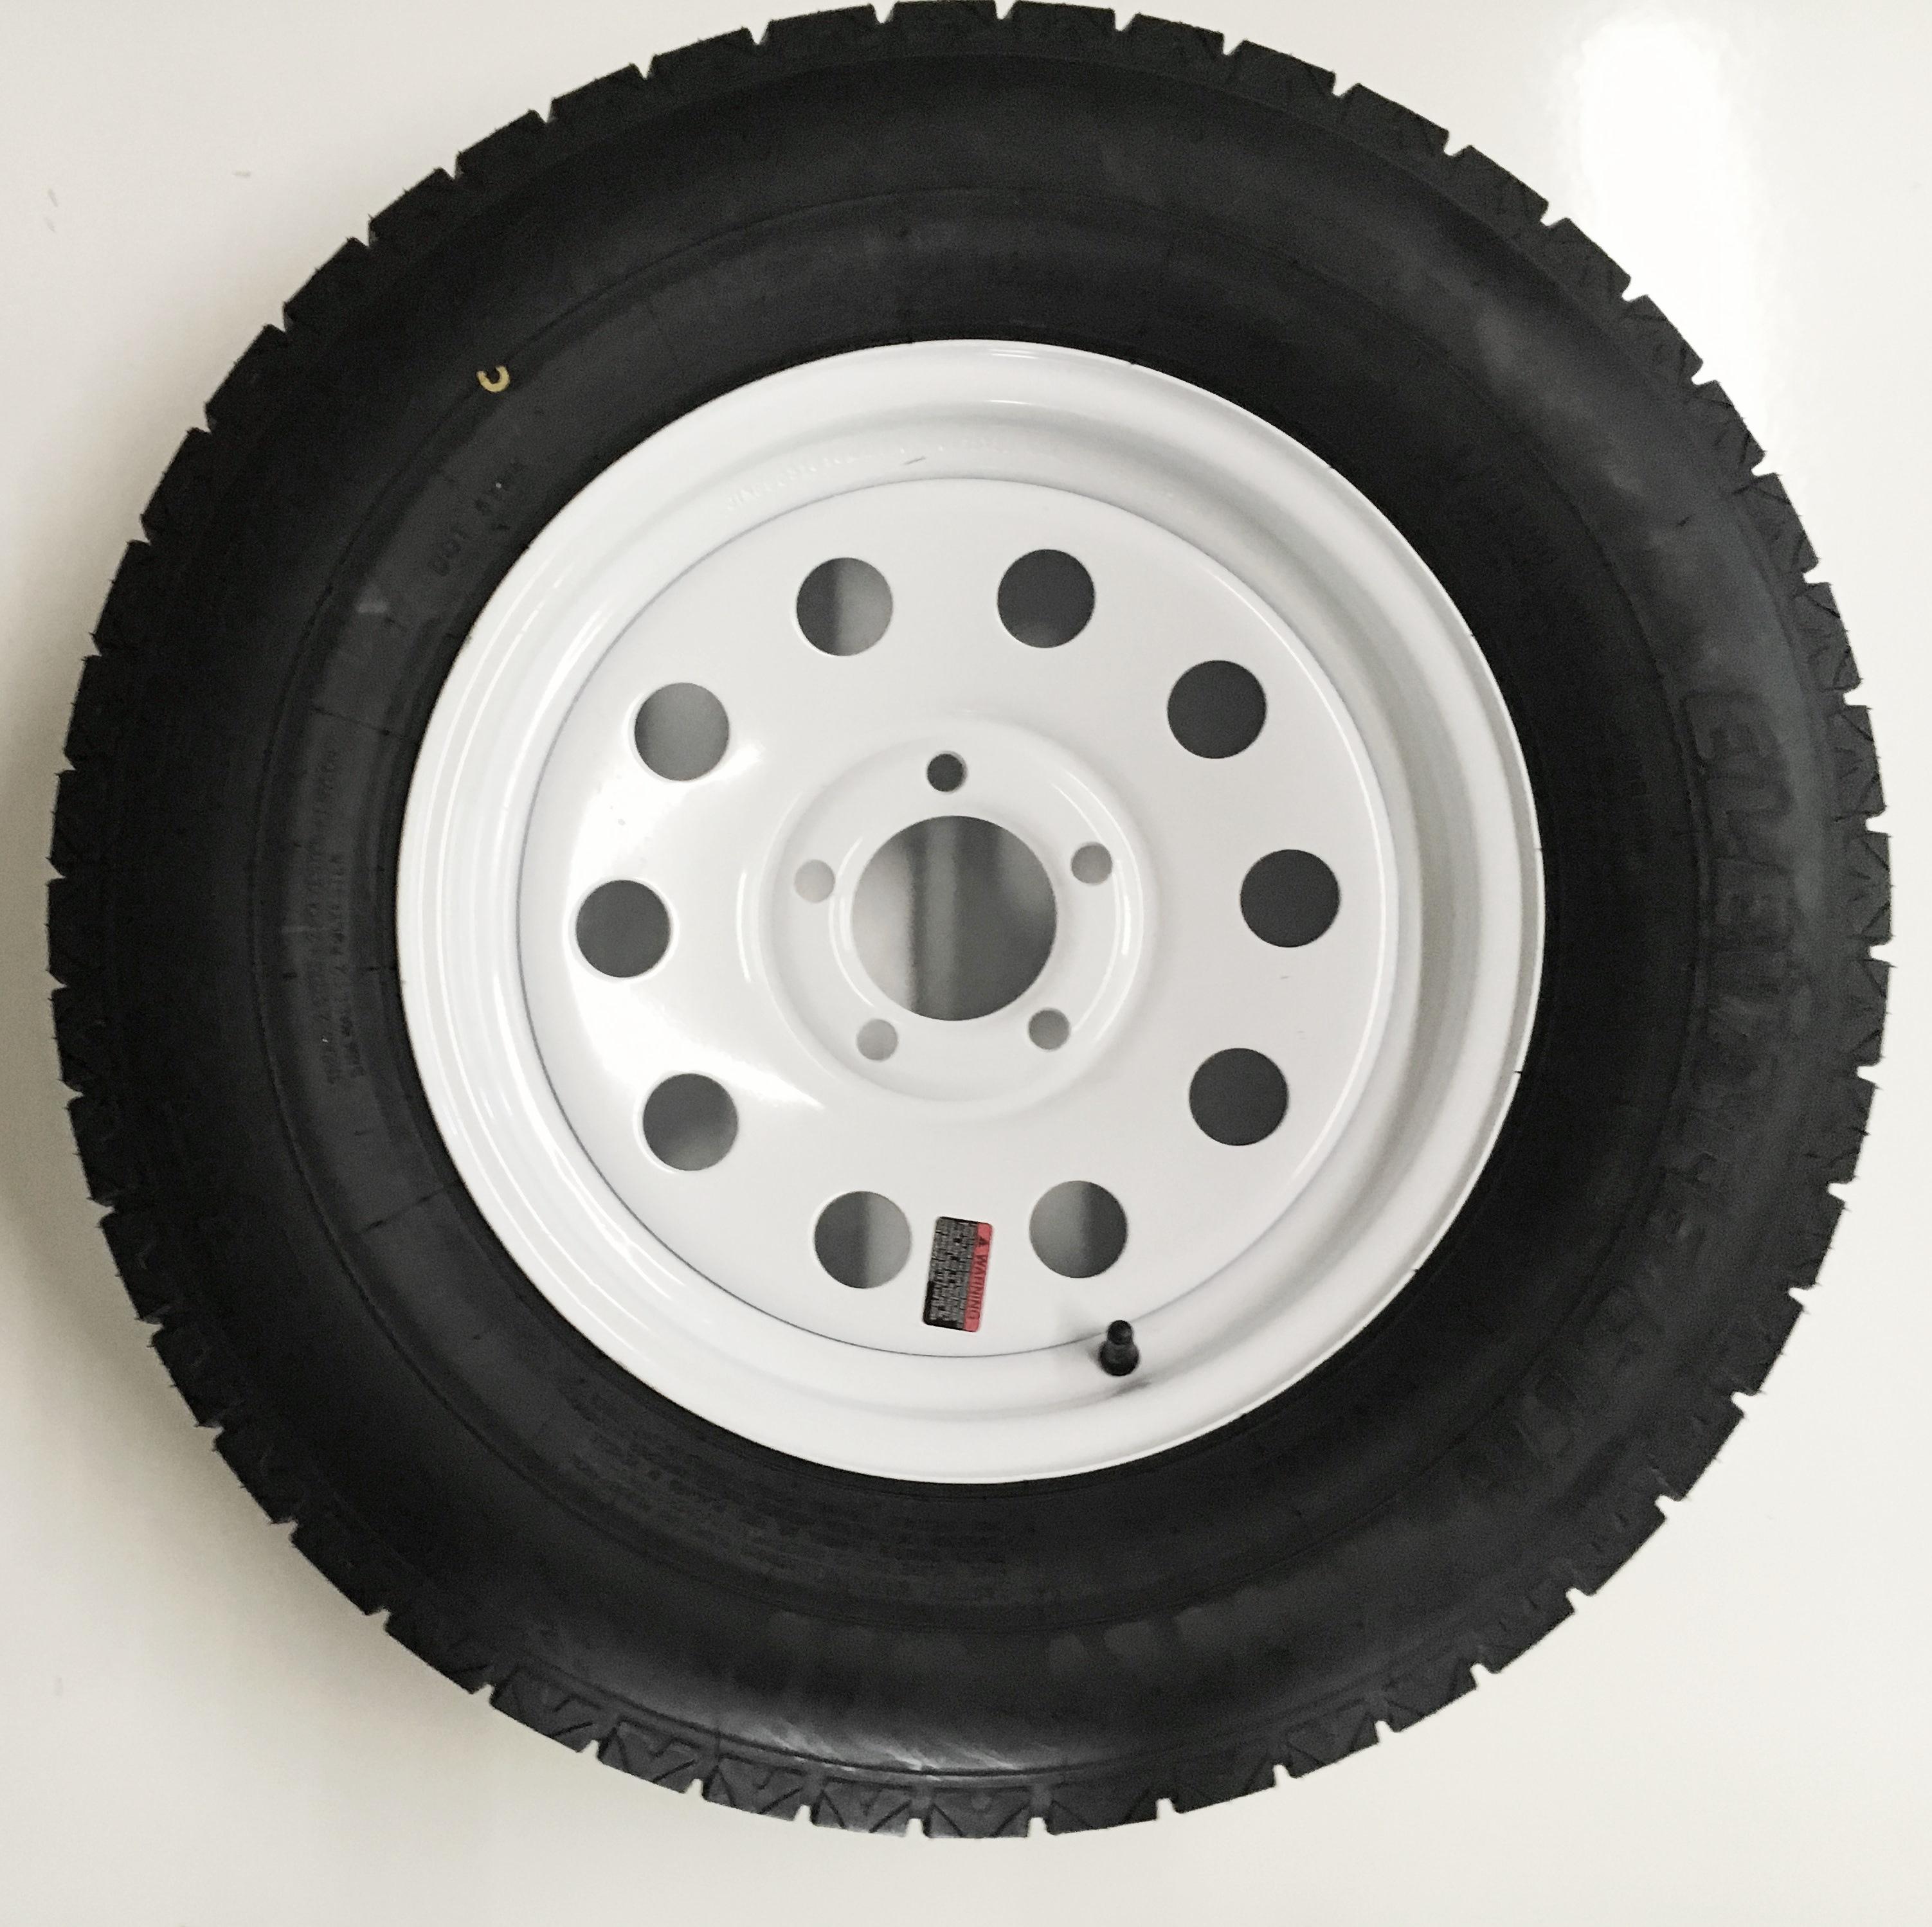 2 Pack Goodyear Endurance Trailer Tire On Rim St205 75r15d 5 4 5